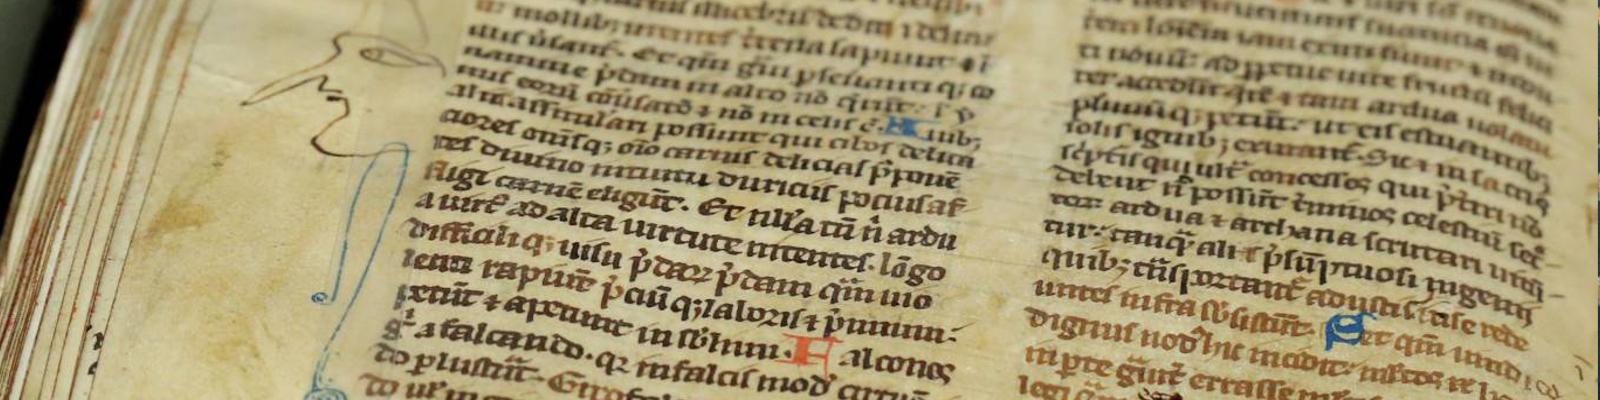 St Marys Manuscript